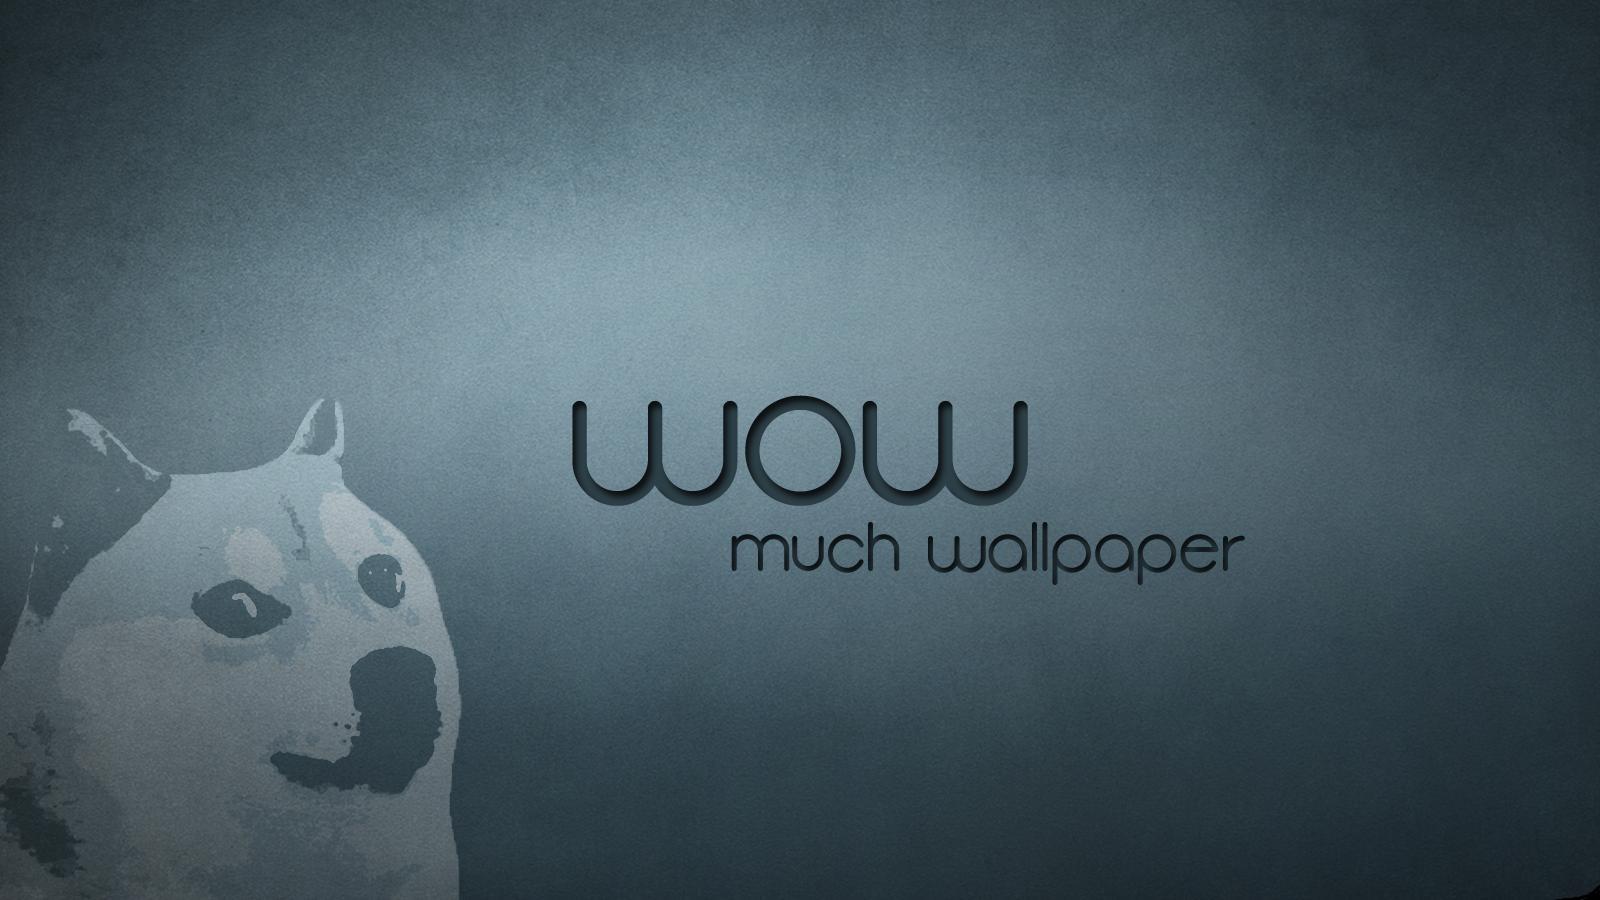 Beautiful Cat Wallpapers Dog Meme Funny Animals Desktop Background